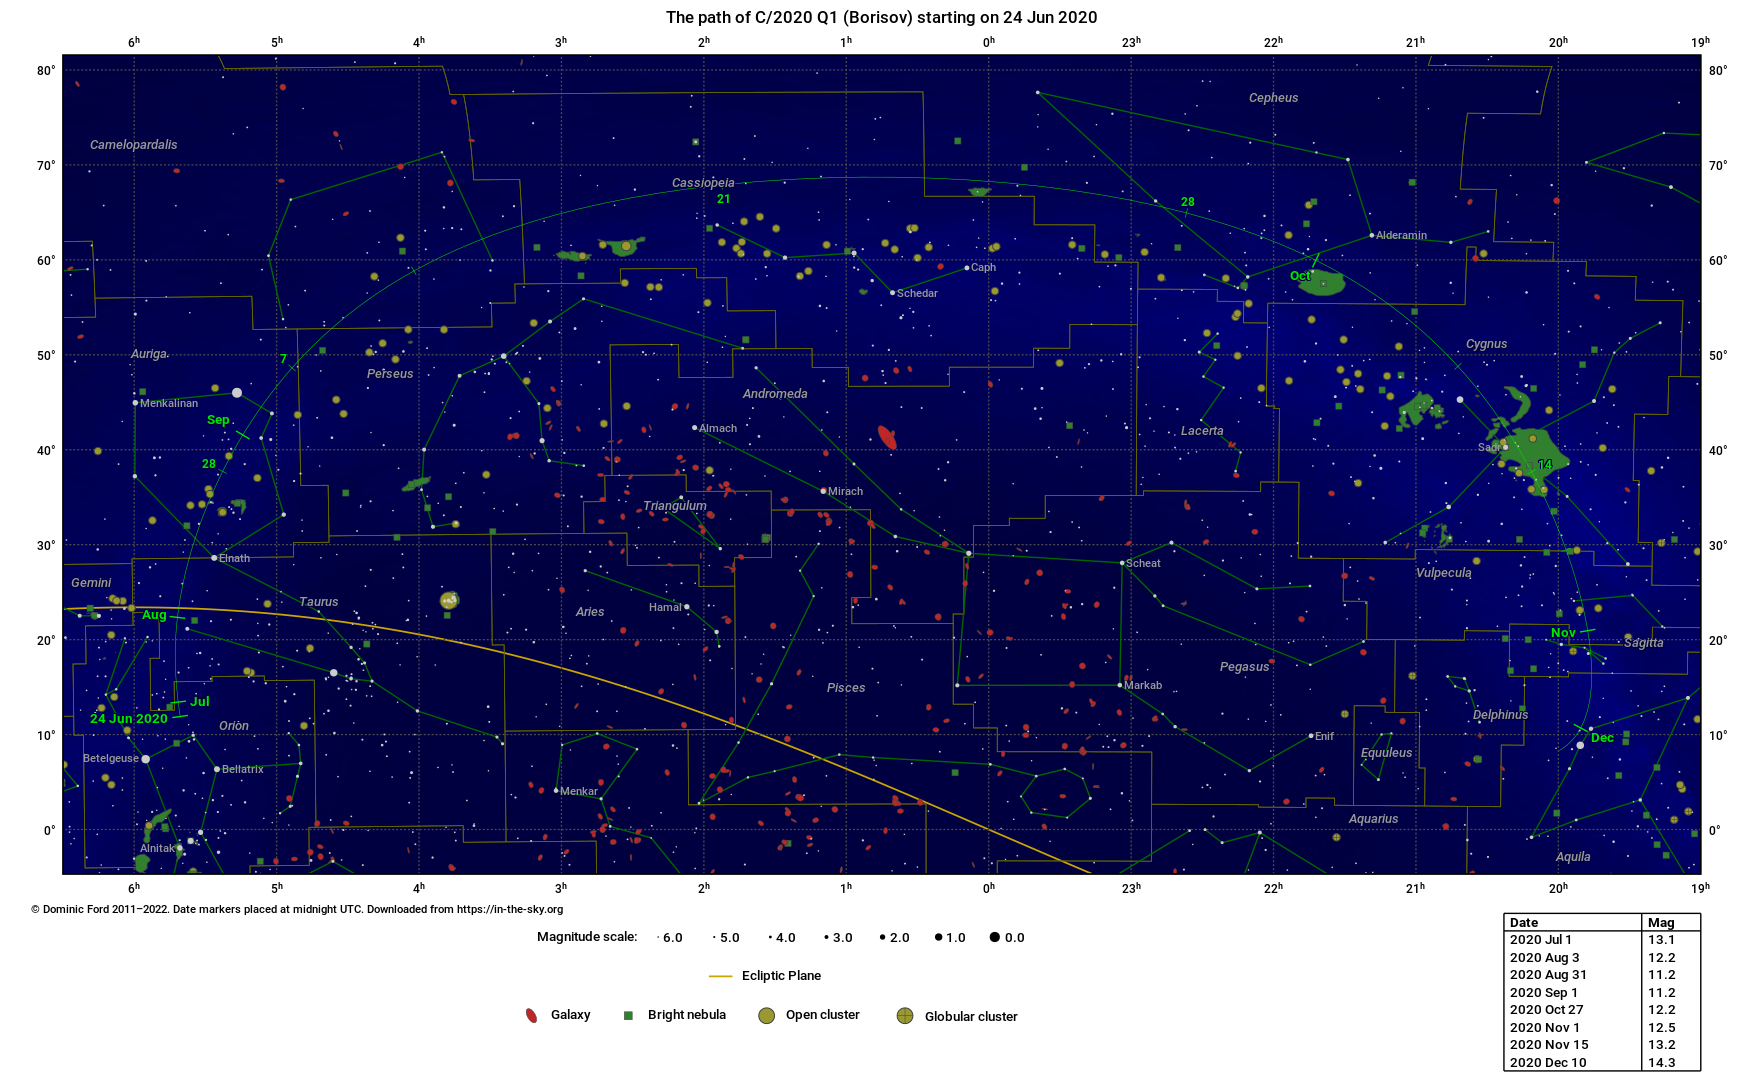 The path traced across the sky by C/2020 Q1 (Borisov)